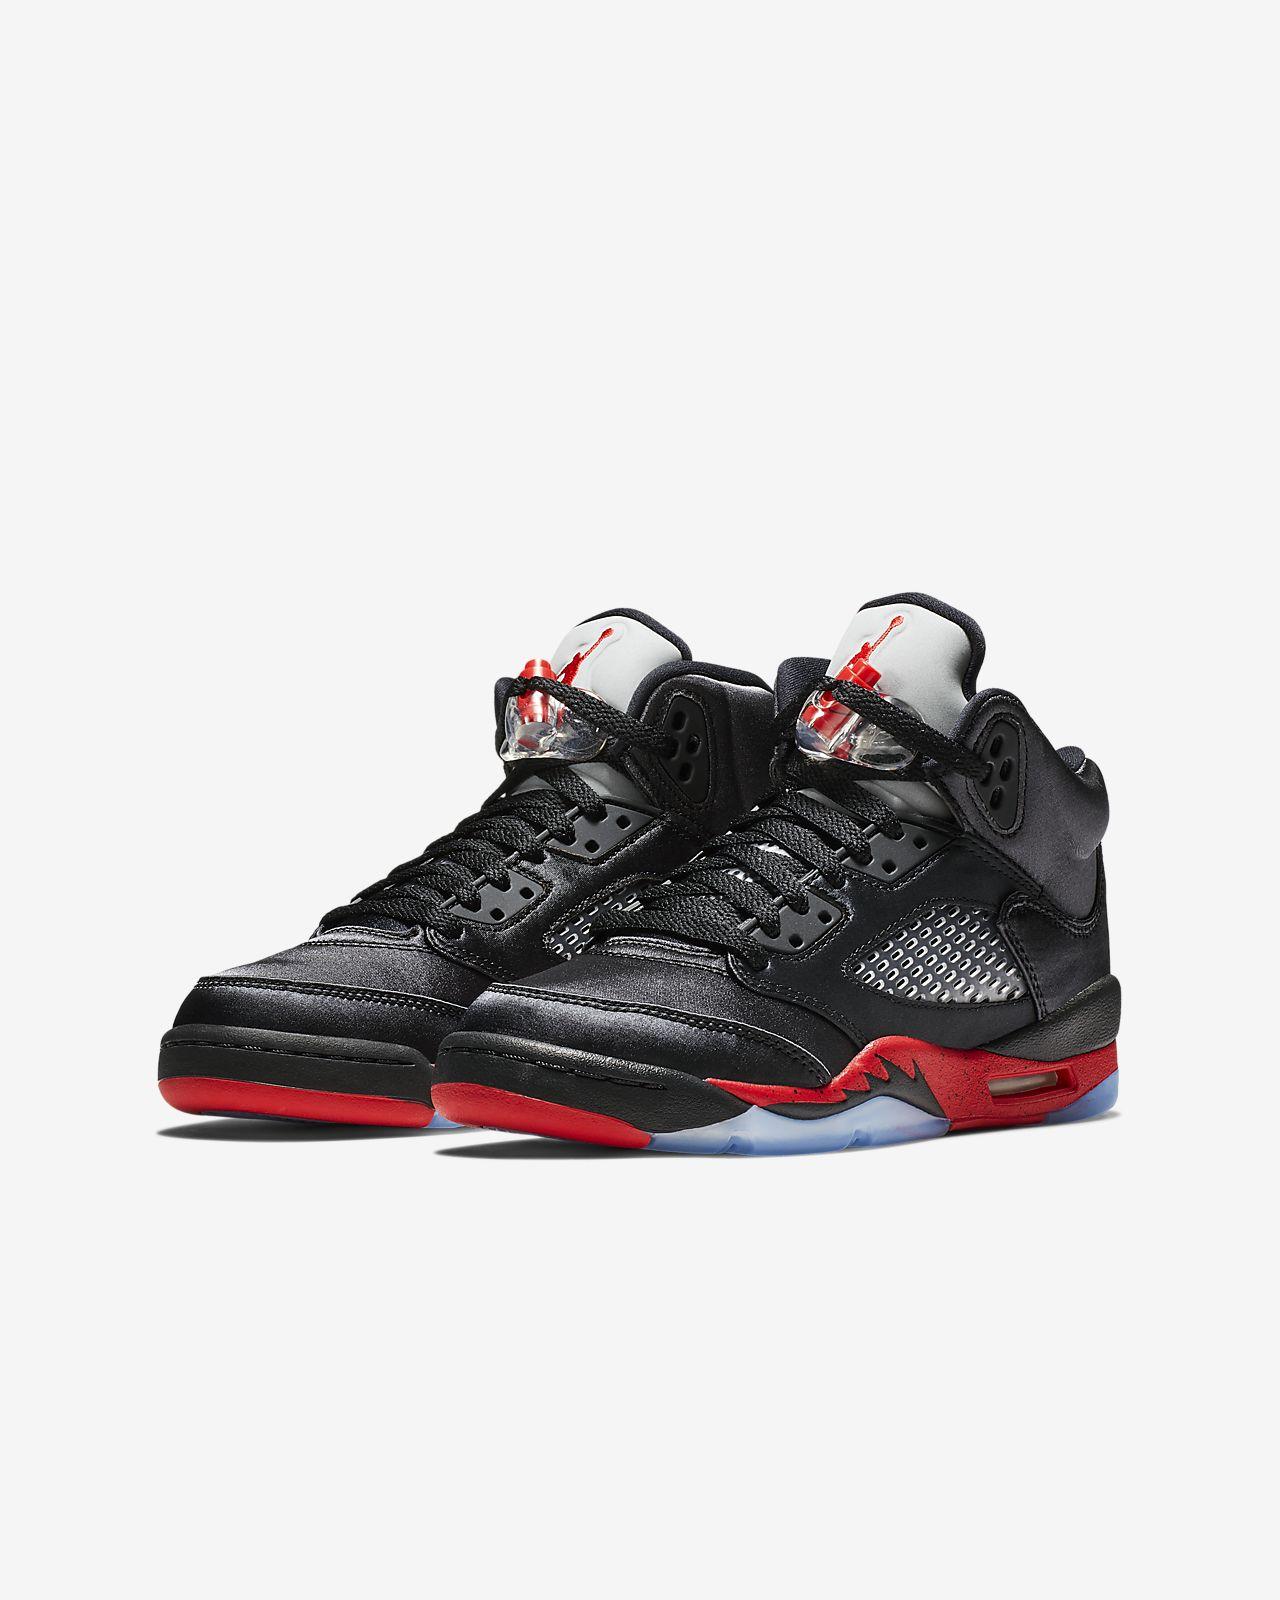 Air Jordan DE charmant und Stilvoll Nike Kinder. ältere für